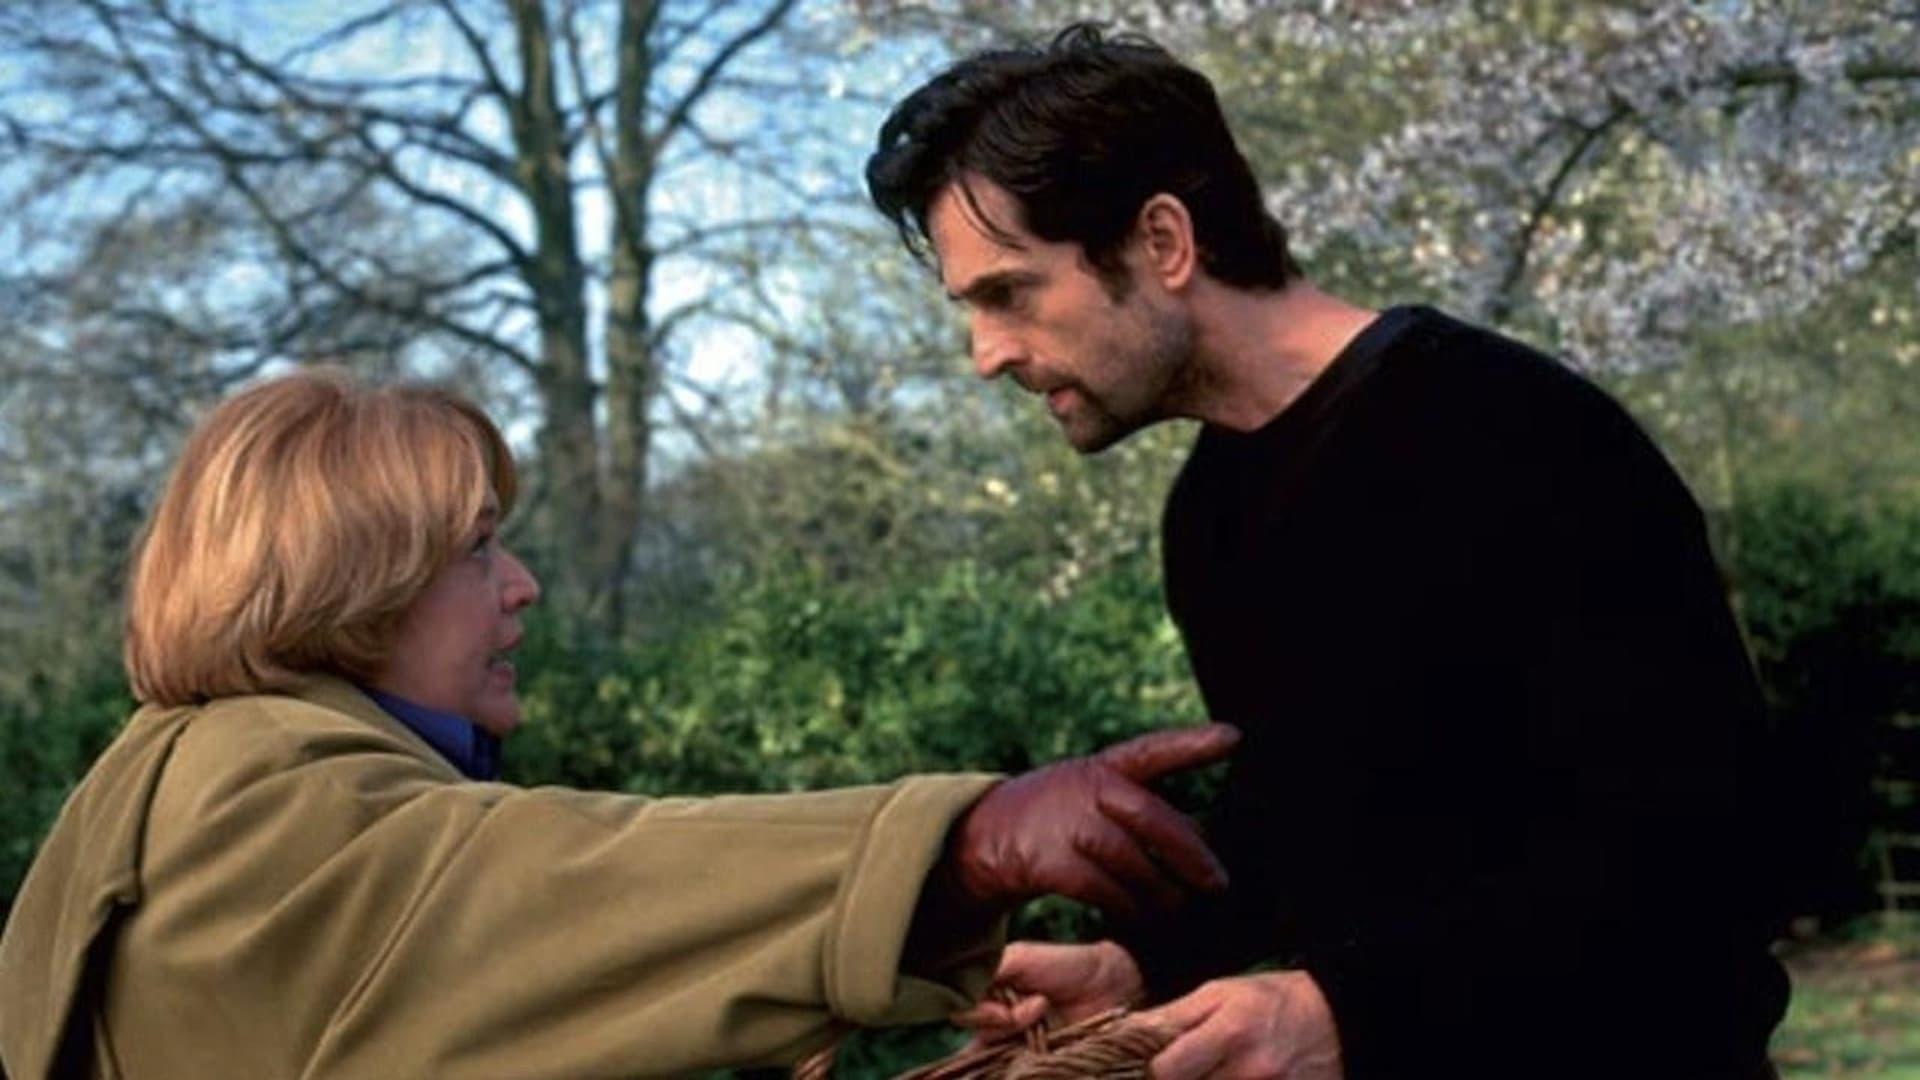 Amours suspectes (2002)